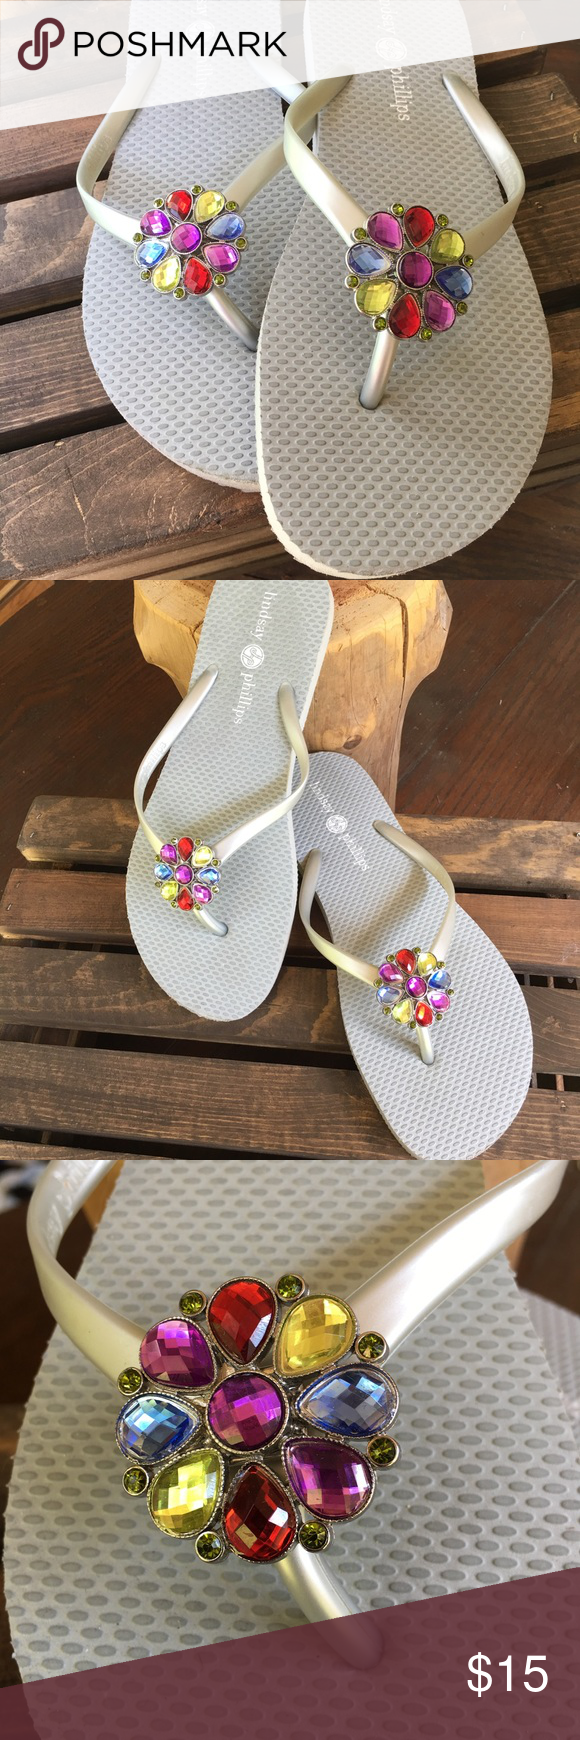 Lindsay Phillips flip flops Cute changeable flip flops